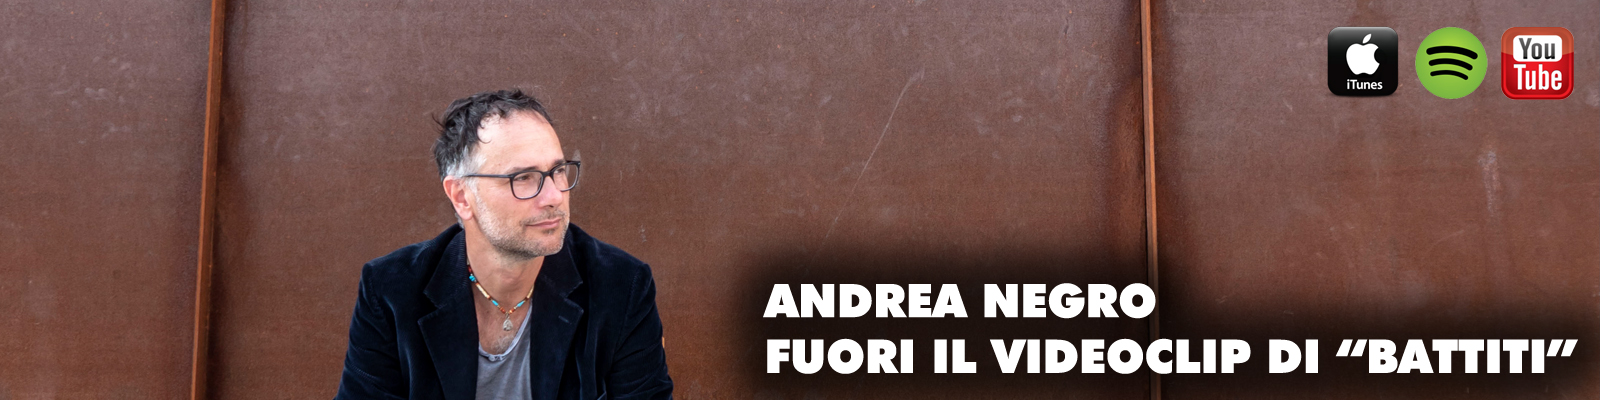 Andrea Negro